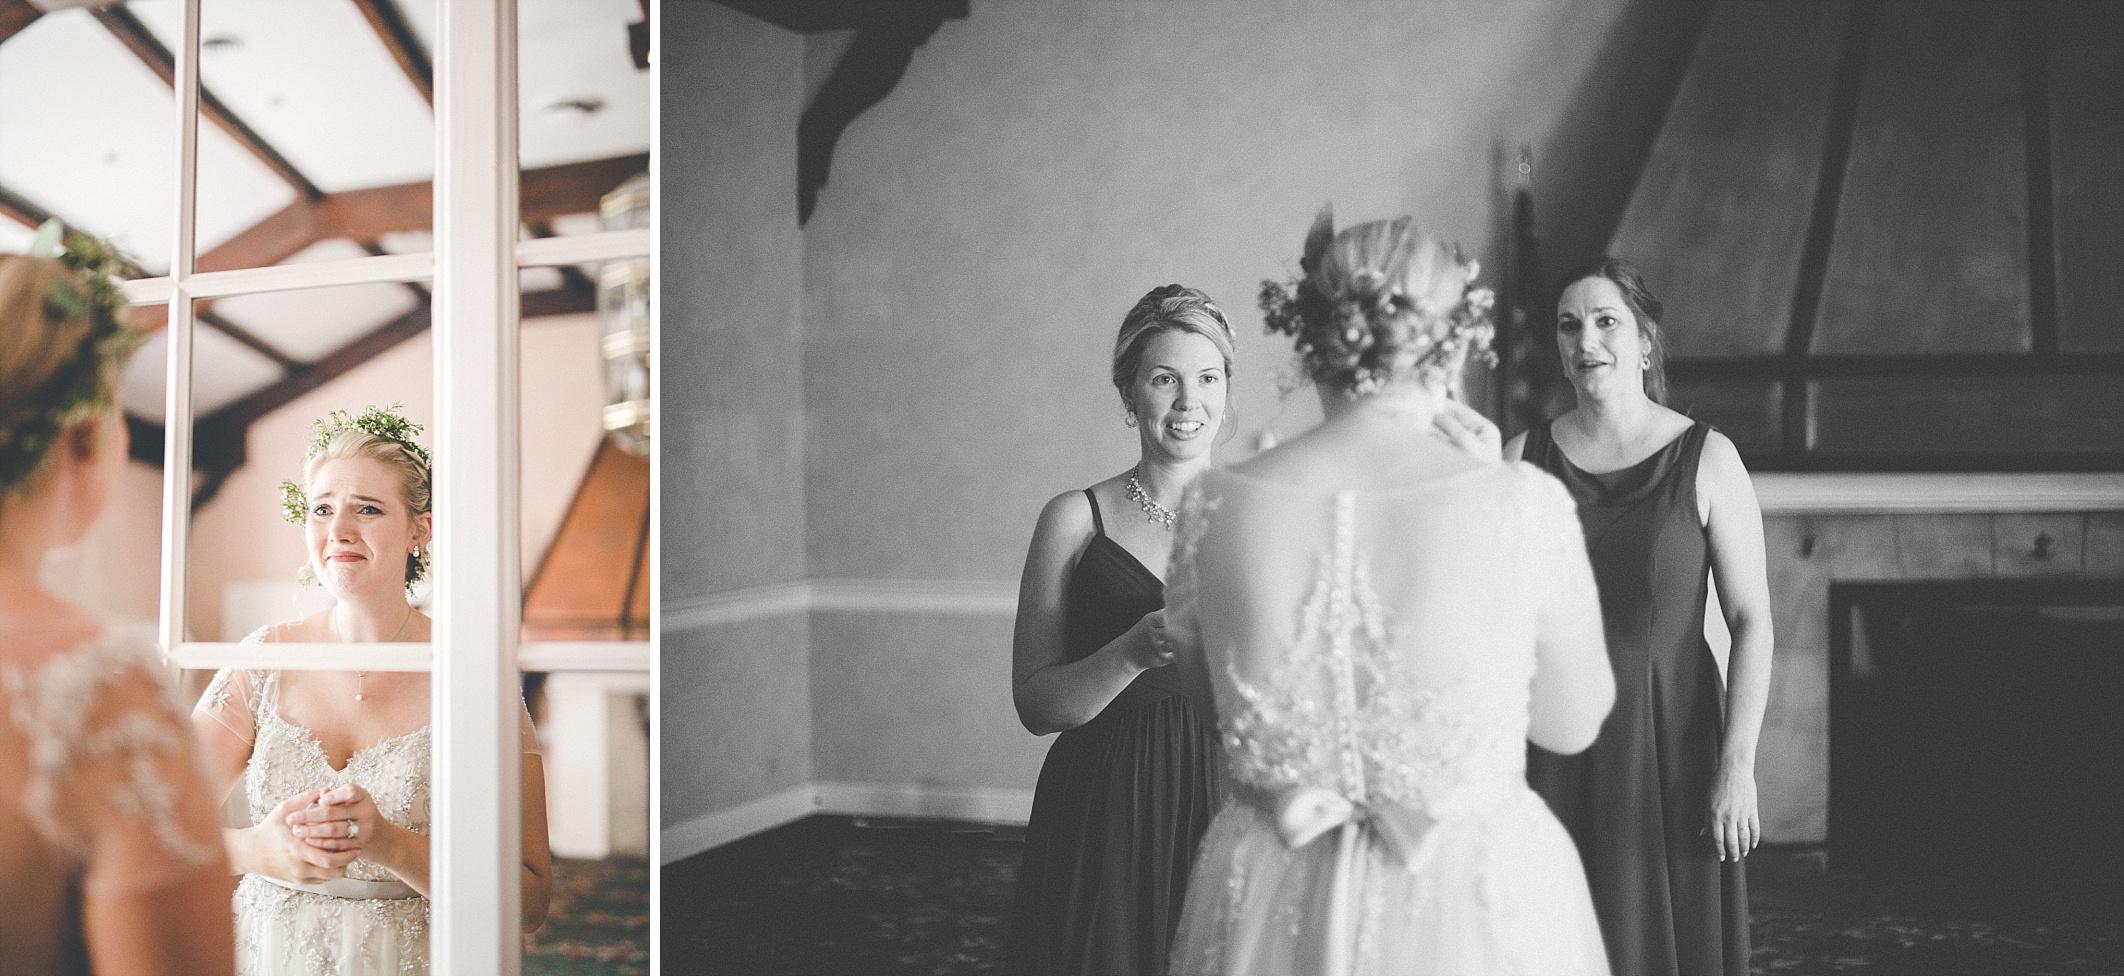 wedding-photographer-dayton-ohio_0088.jpg